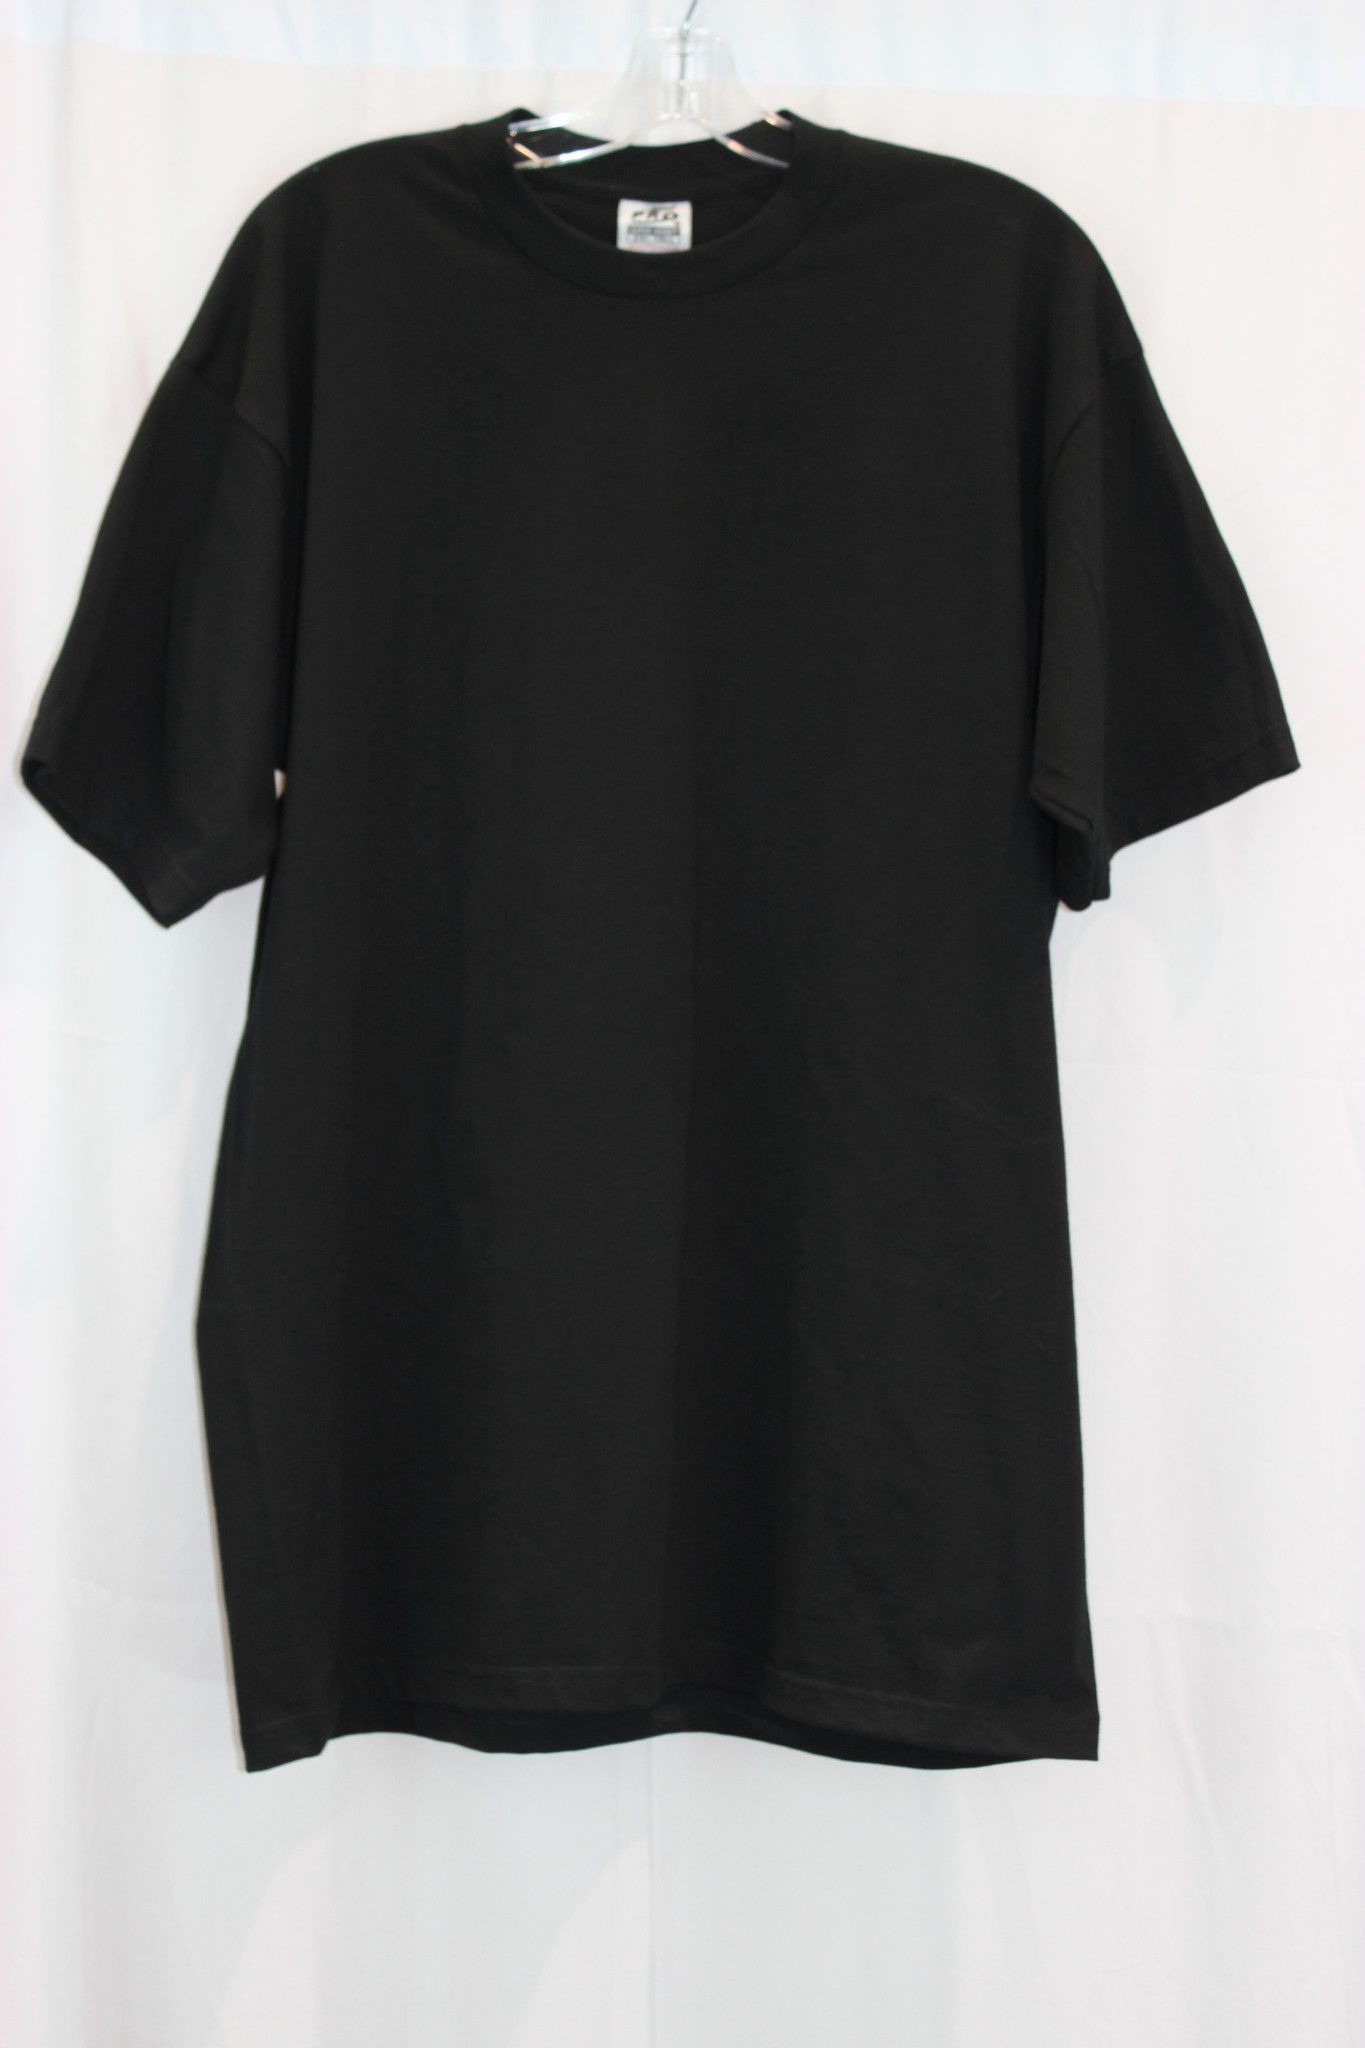 bfe1d1d0 **ALL COLORS, TALL & REGULAR SIZES** Pro 5 Super Heavy No Pocket Short  Sleeve T-Shirt